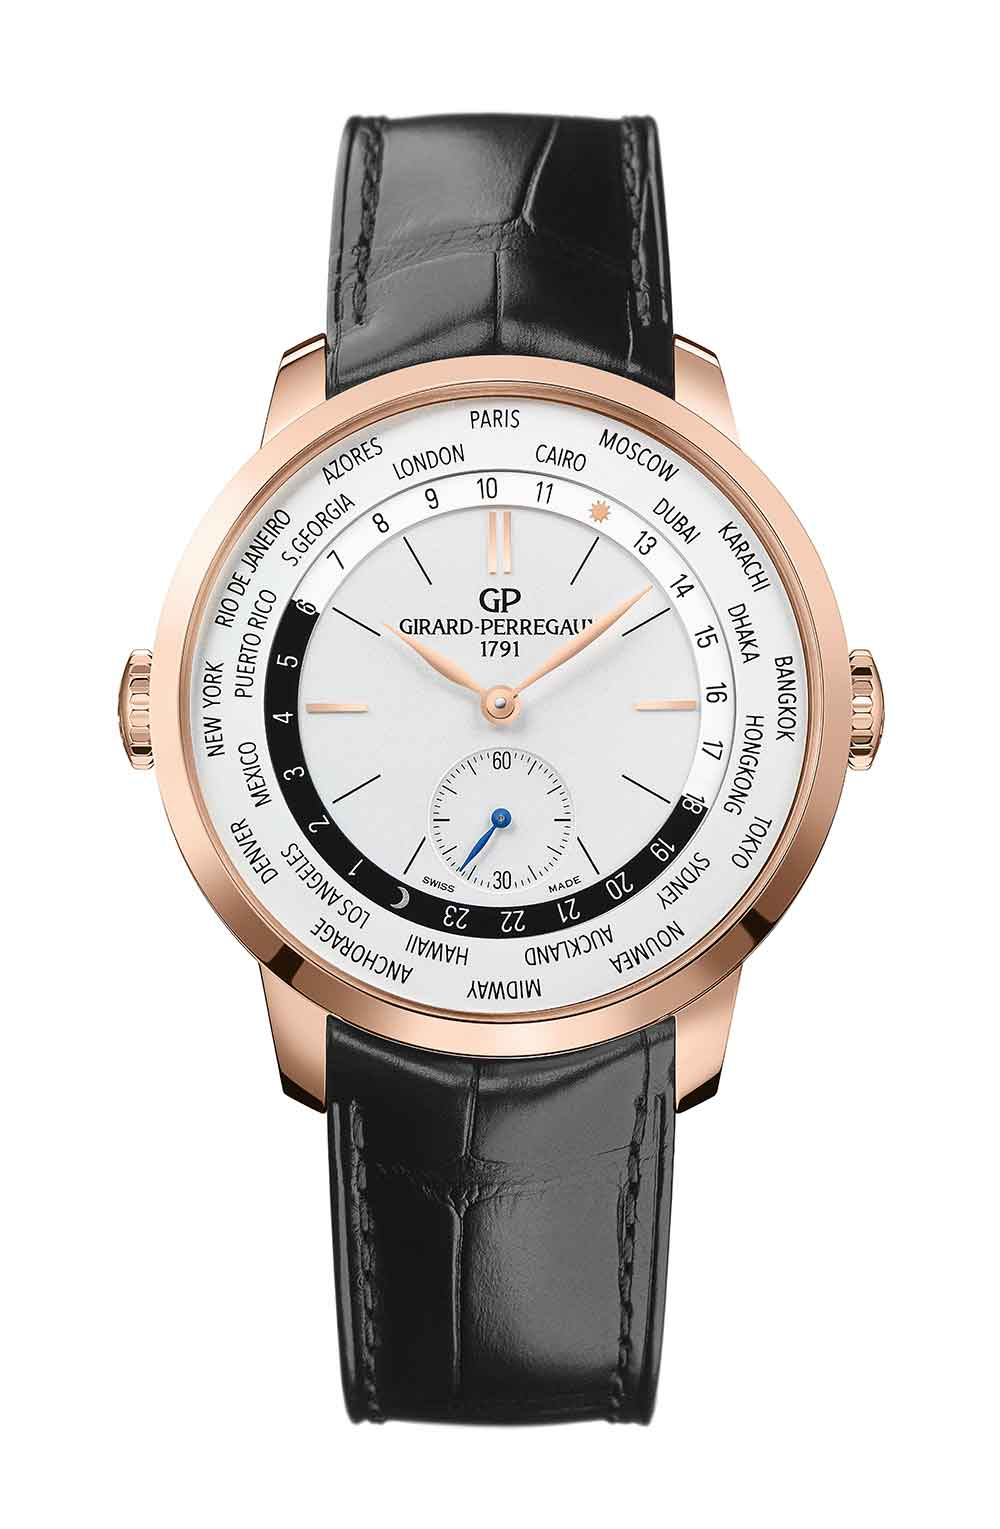 Girard-Perregaux 1966 WW.TC reference 49557-52-131-BB6C in pink gold